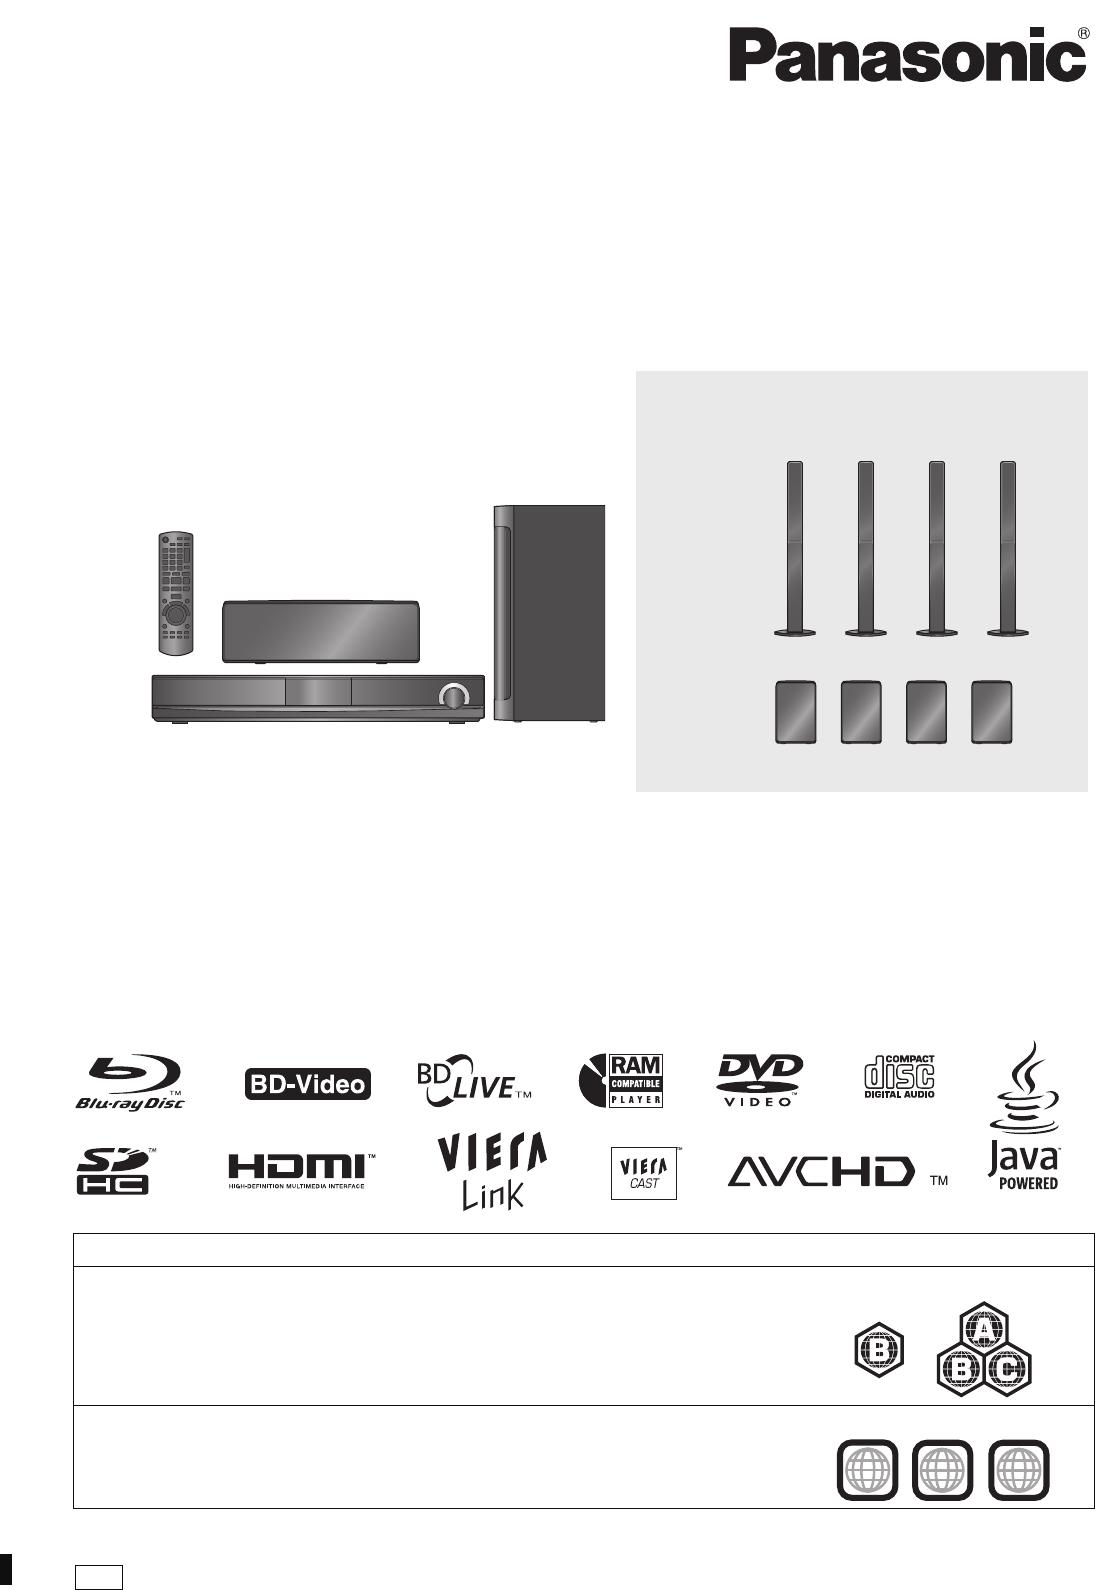 PDF SC BT205